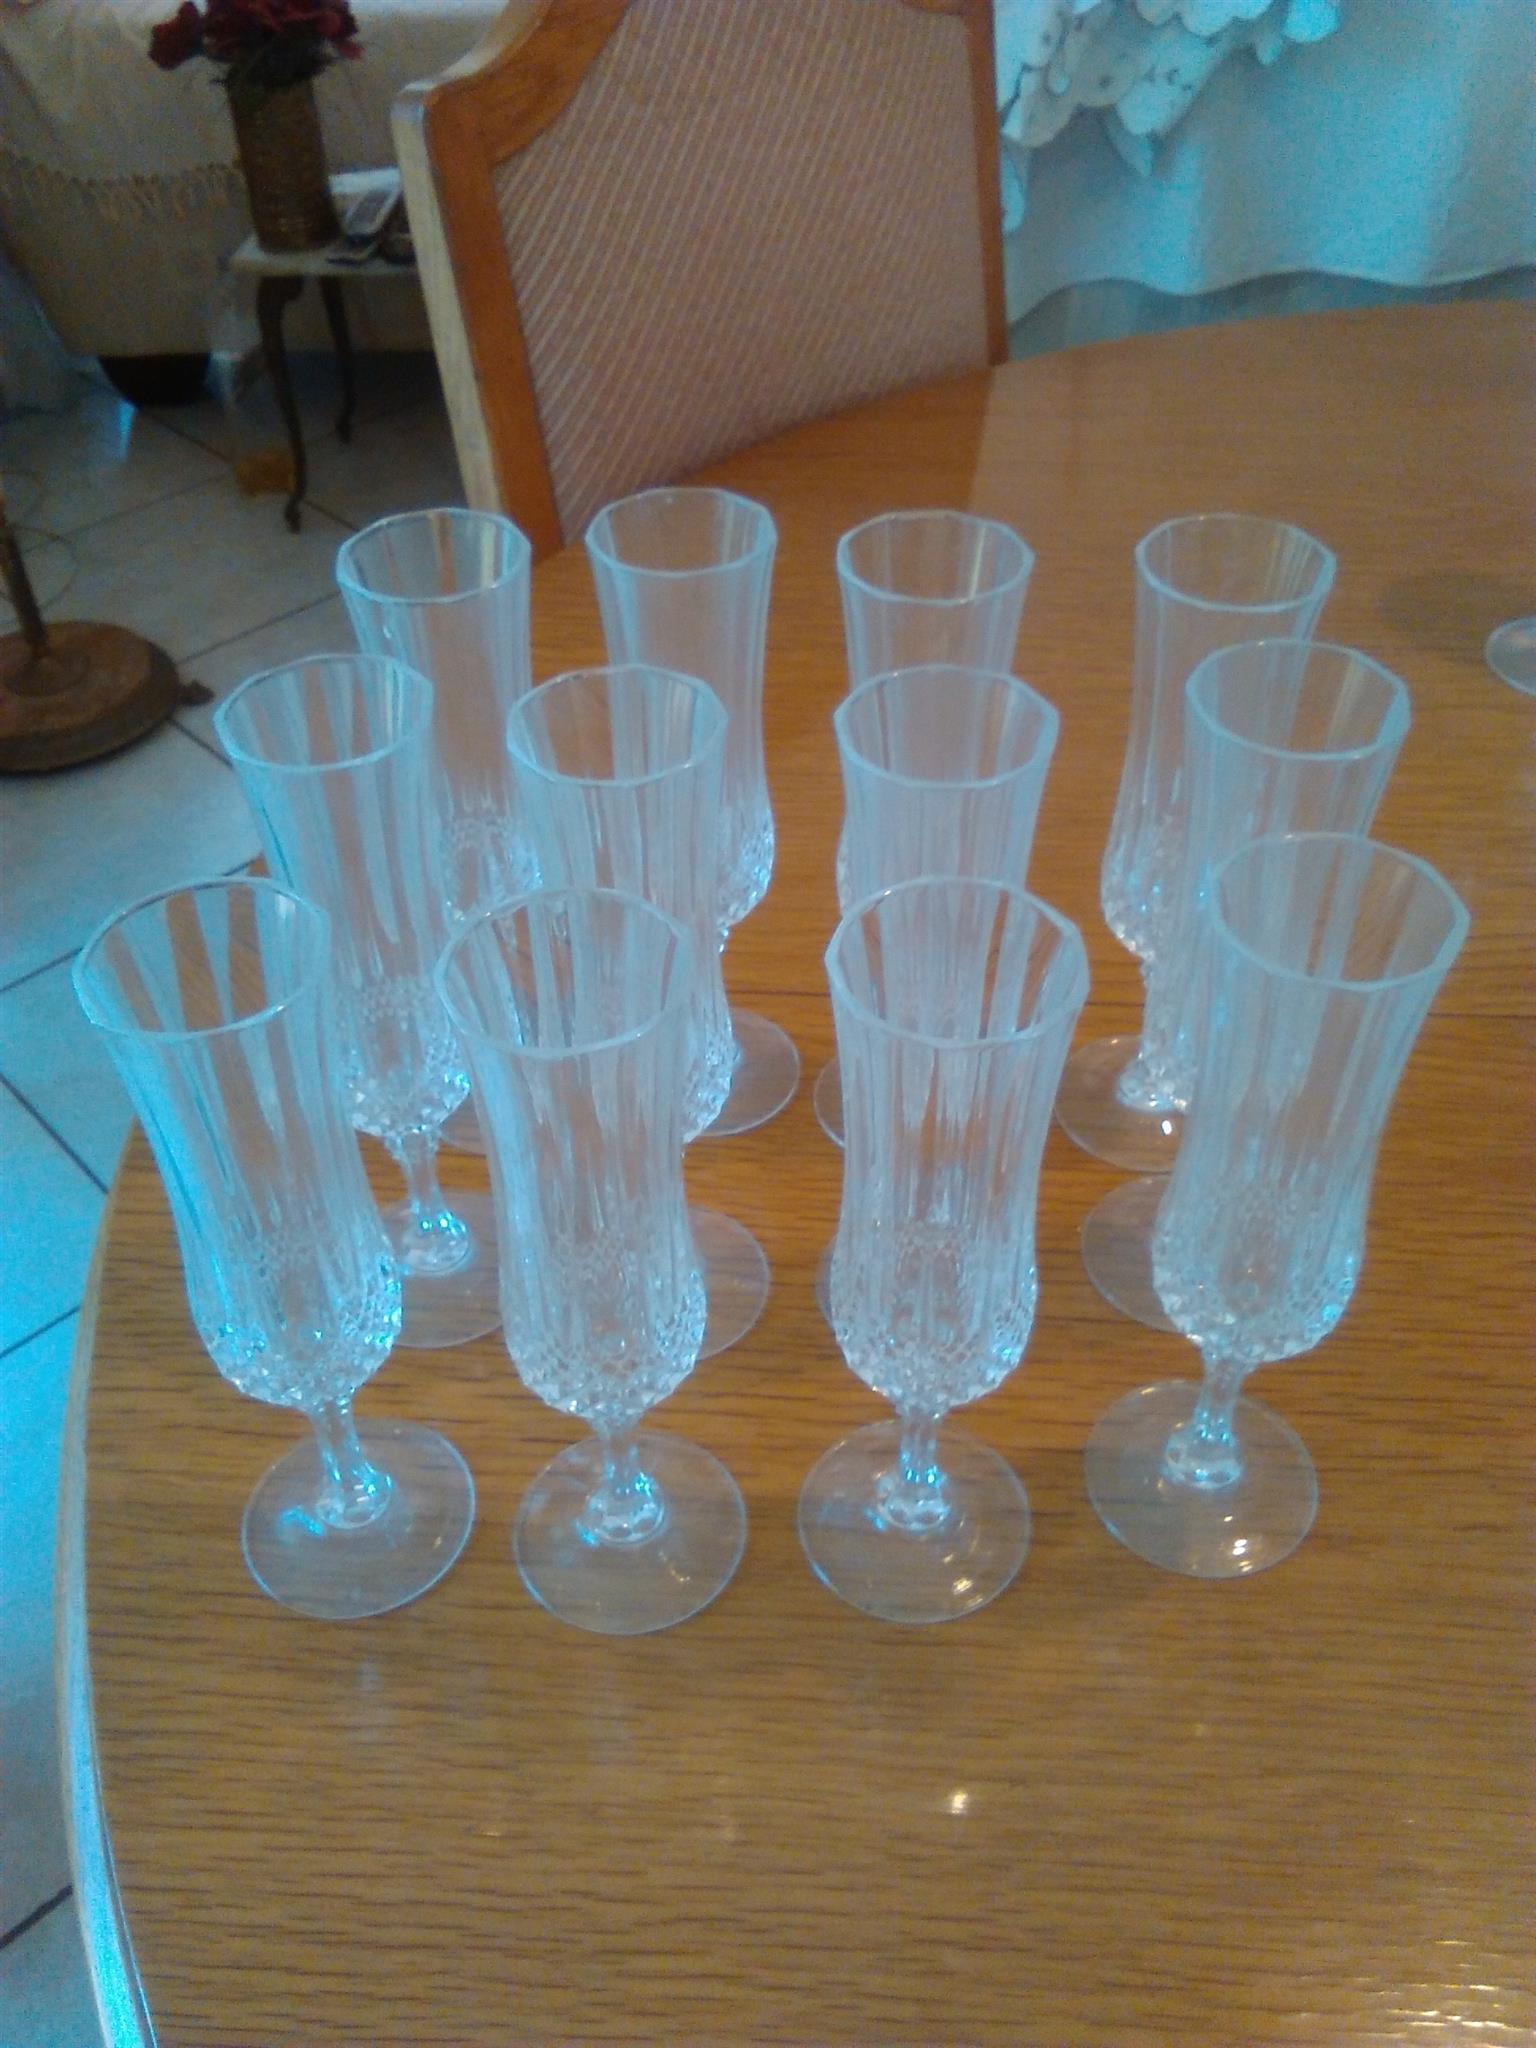 Crystal d Arc Champagne glasses